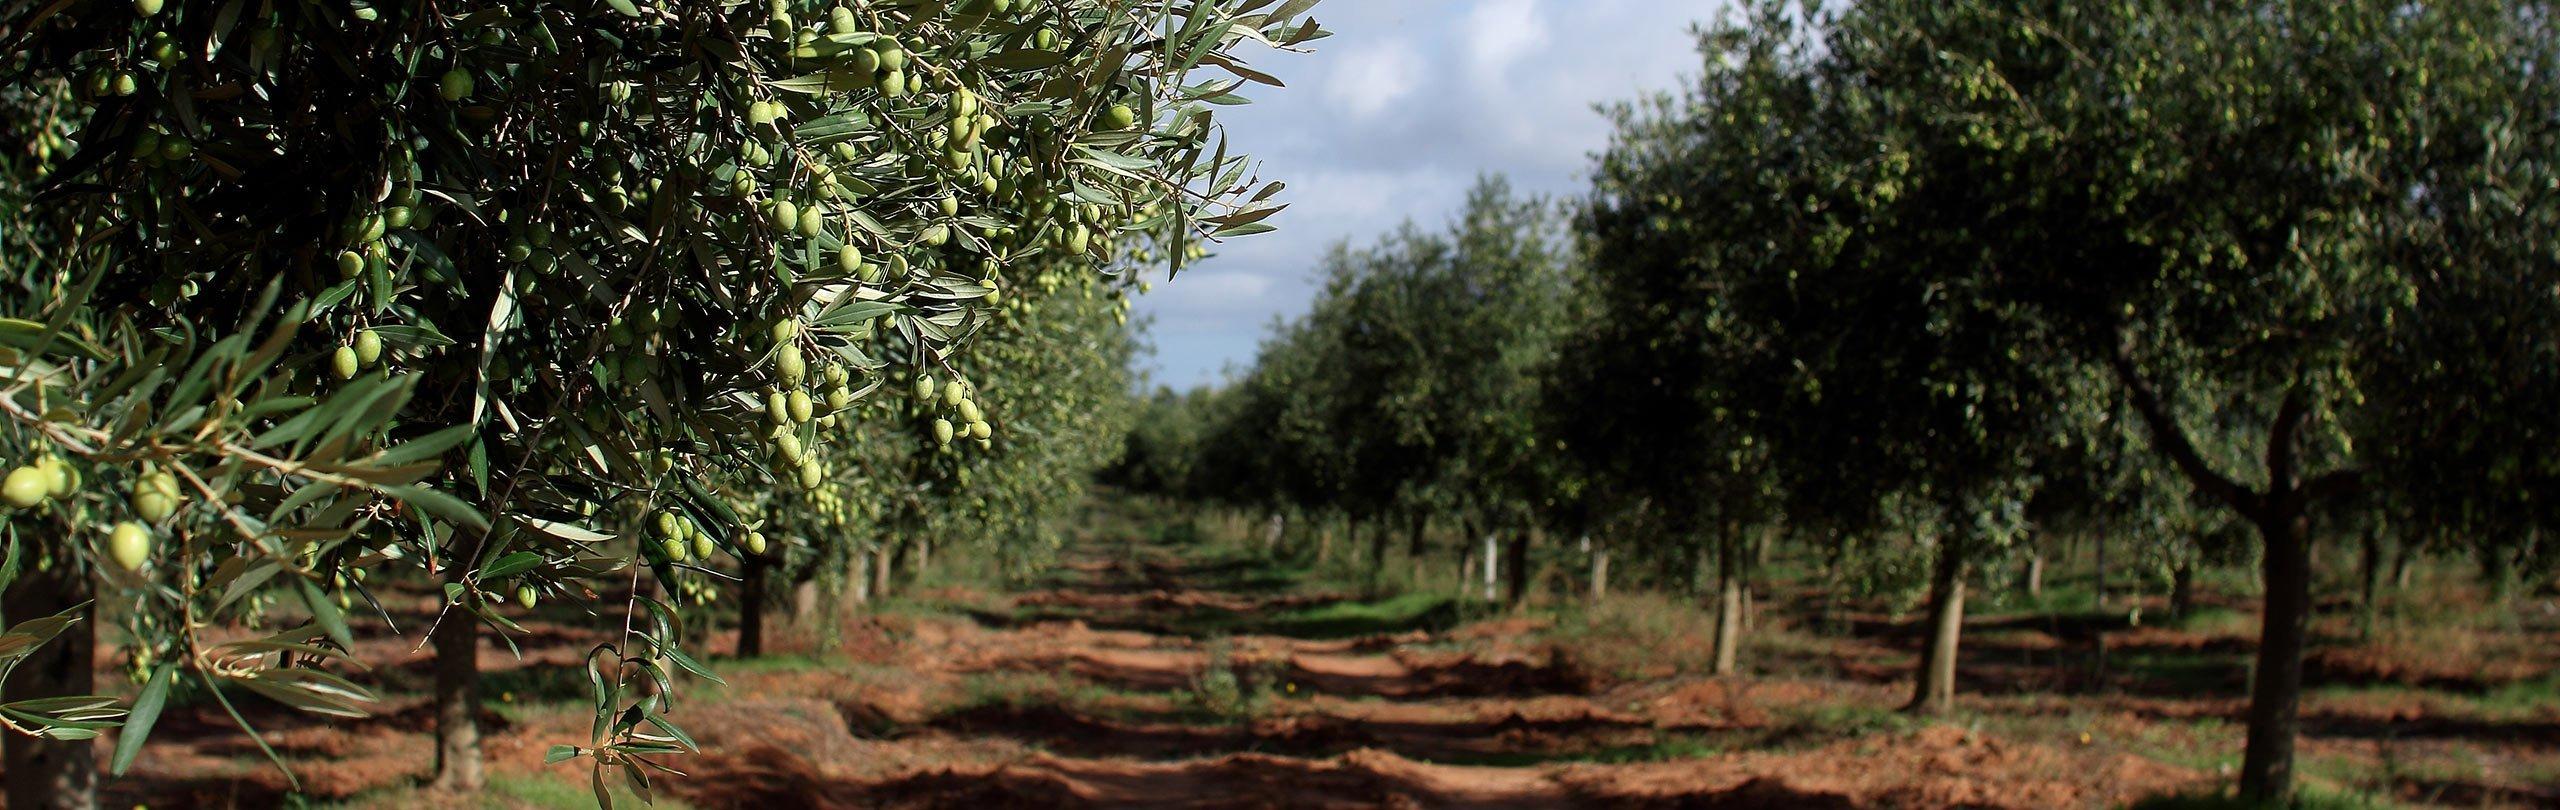 Tenute Fois Accademia Olearia Alghero Sardegna